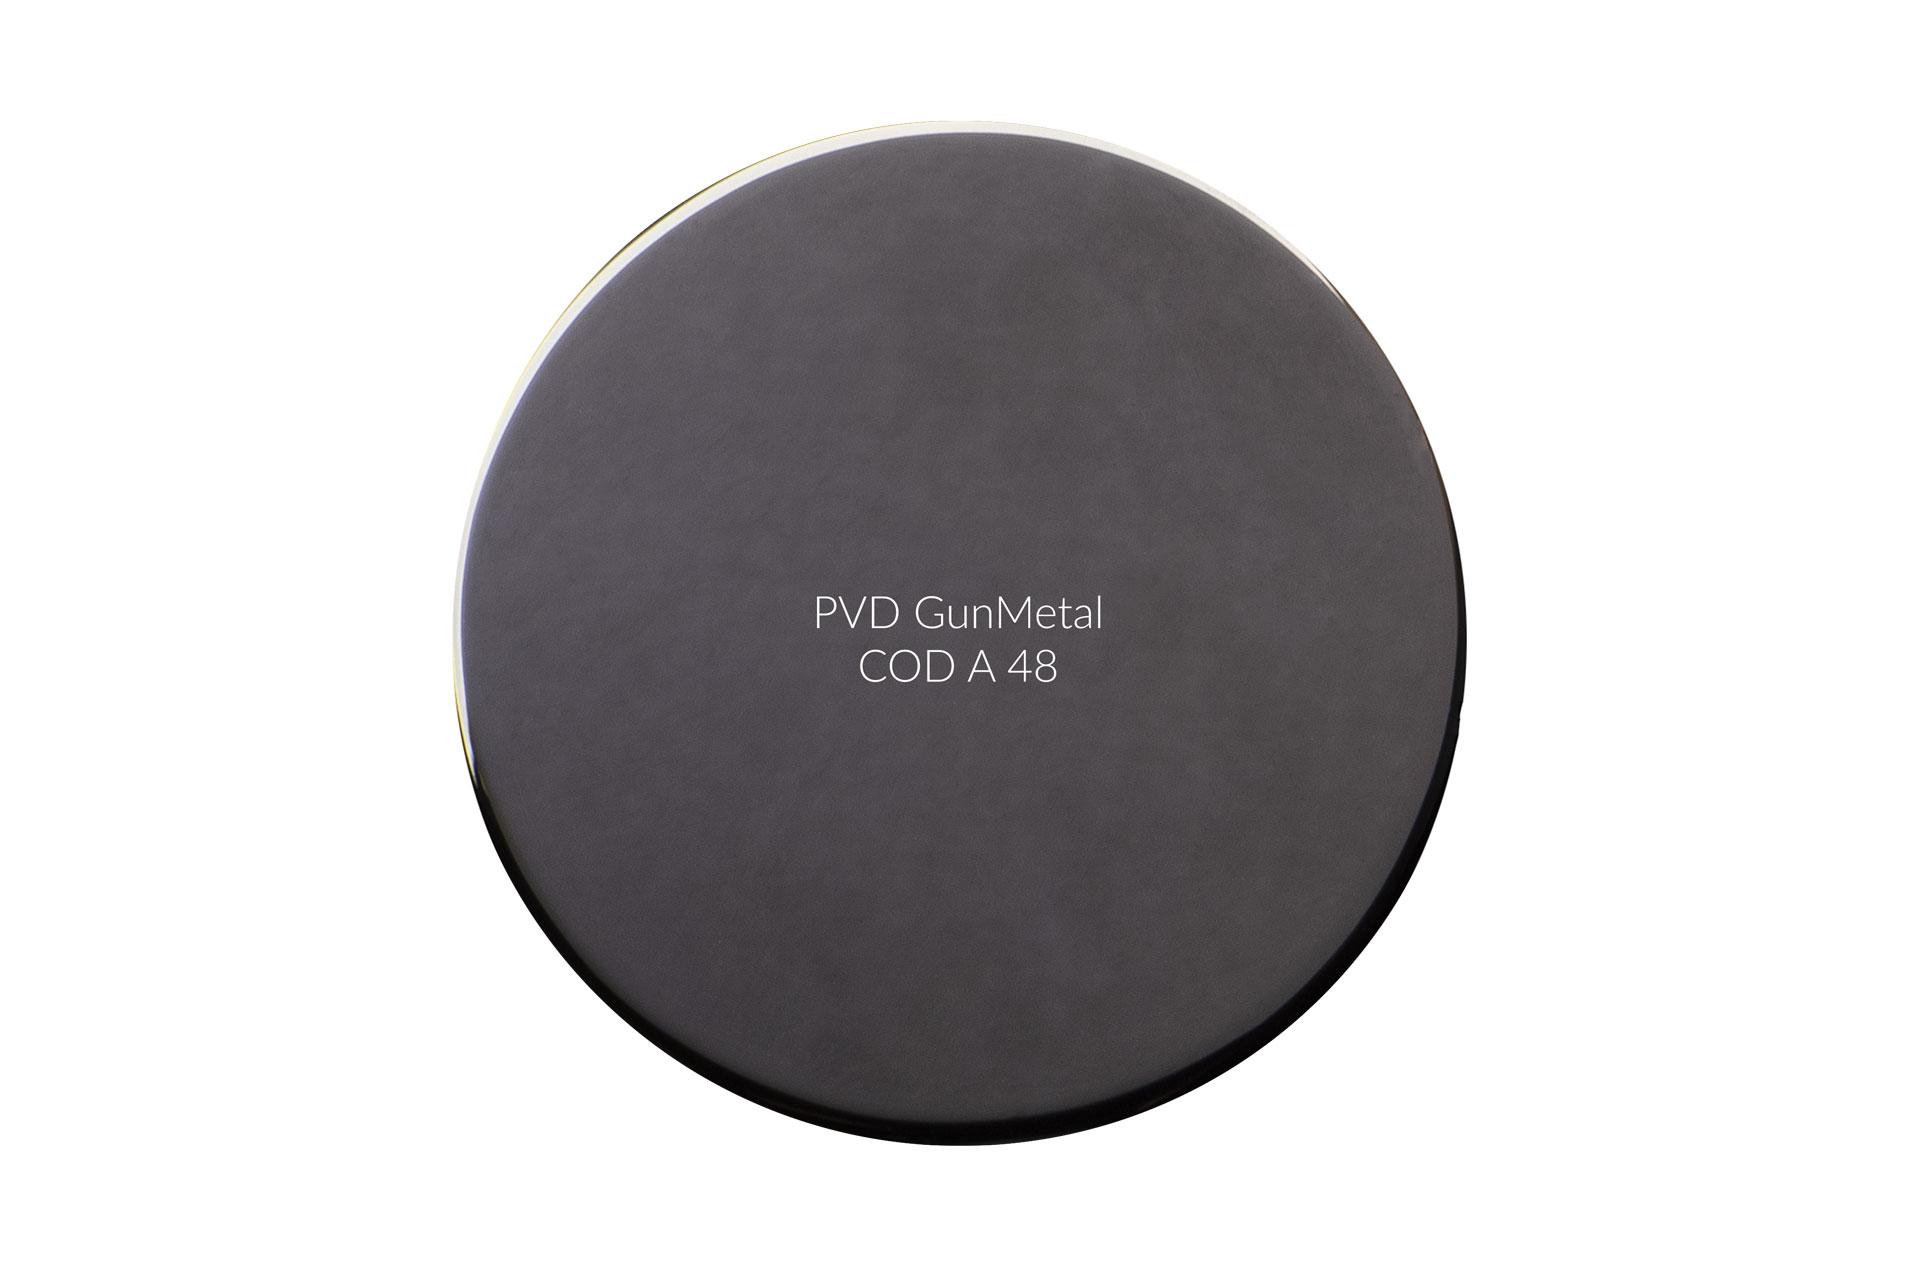 PVD GunMetal cod 48 lucido